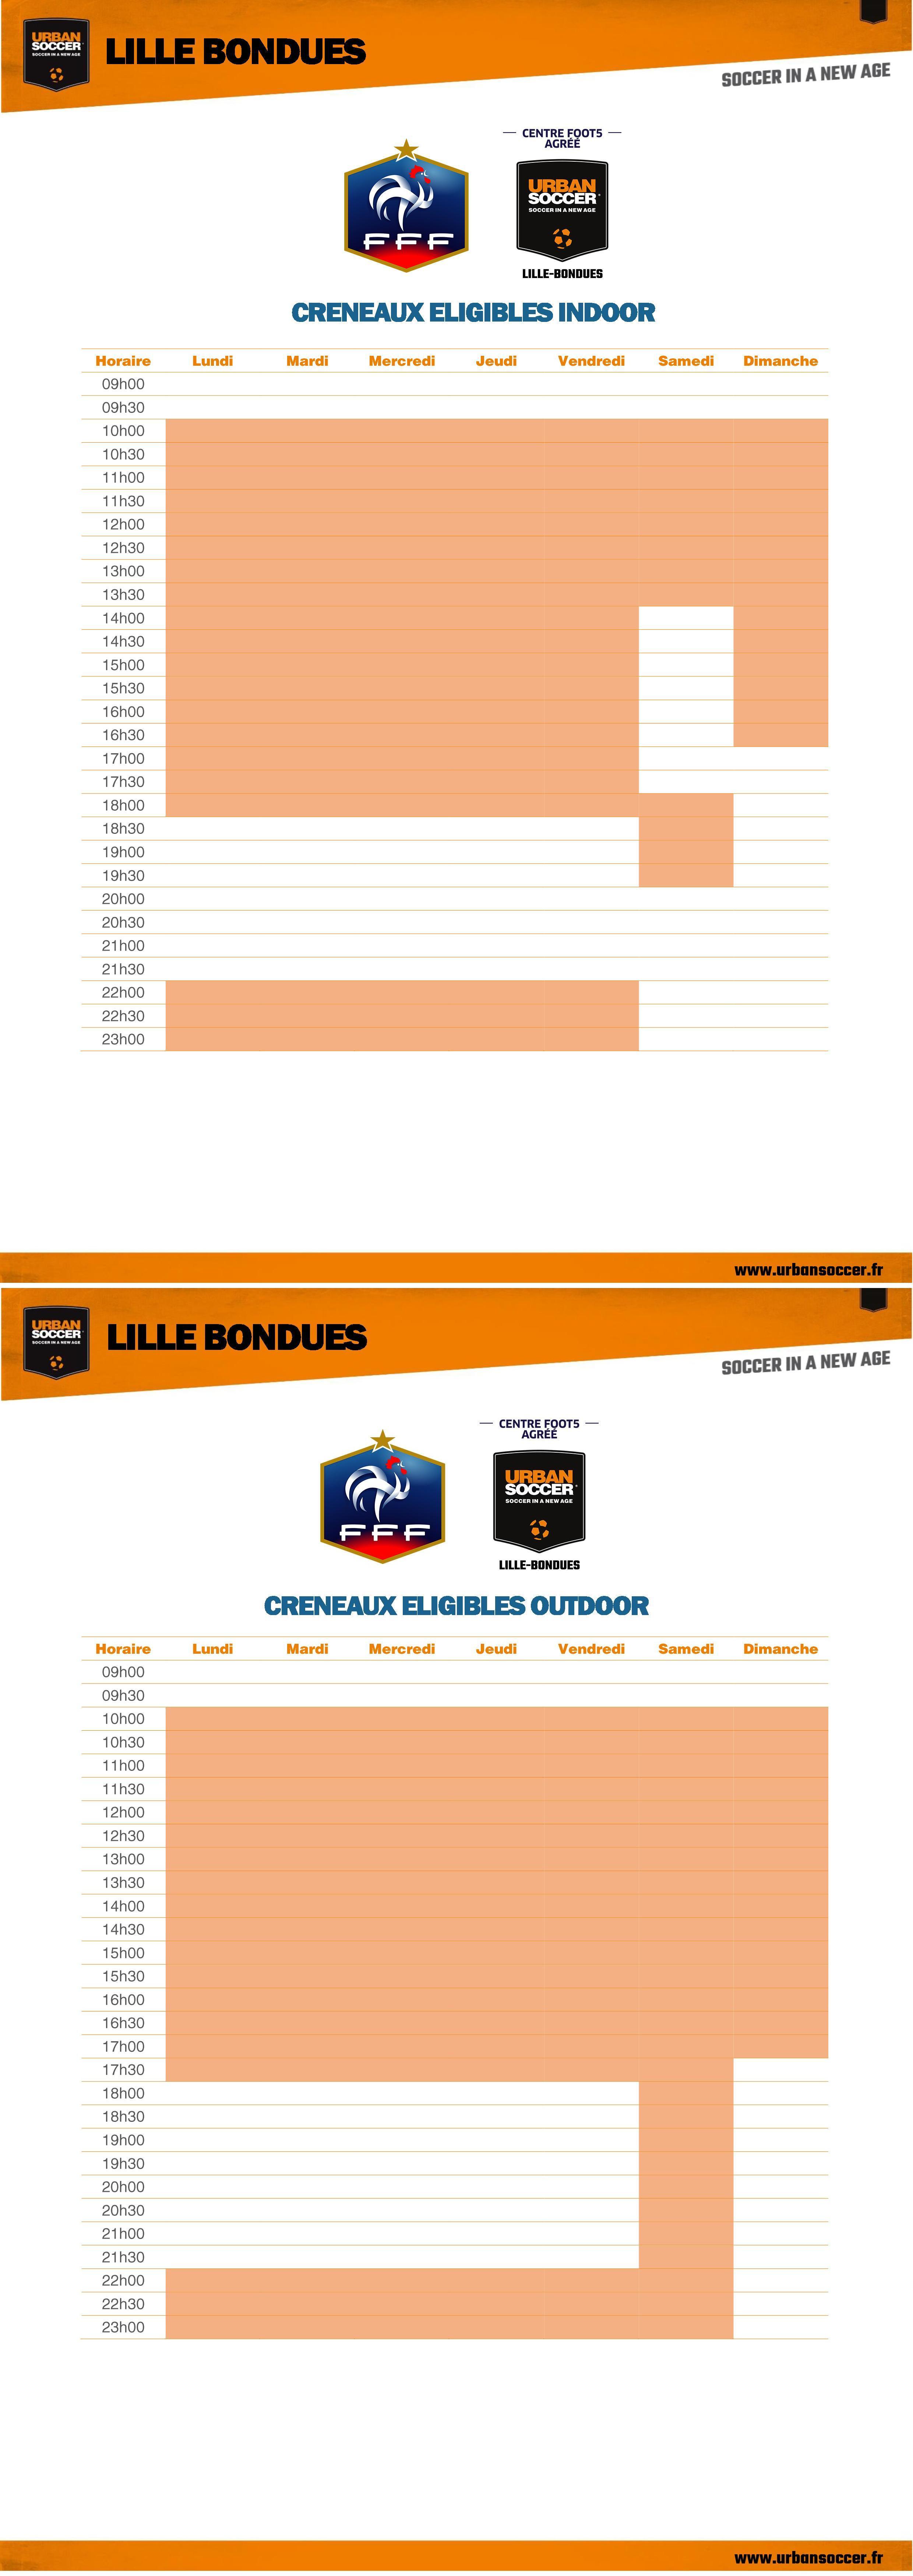 Heures FFF - Lille Bondues